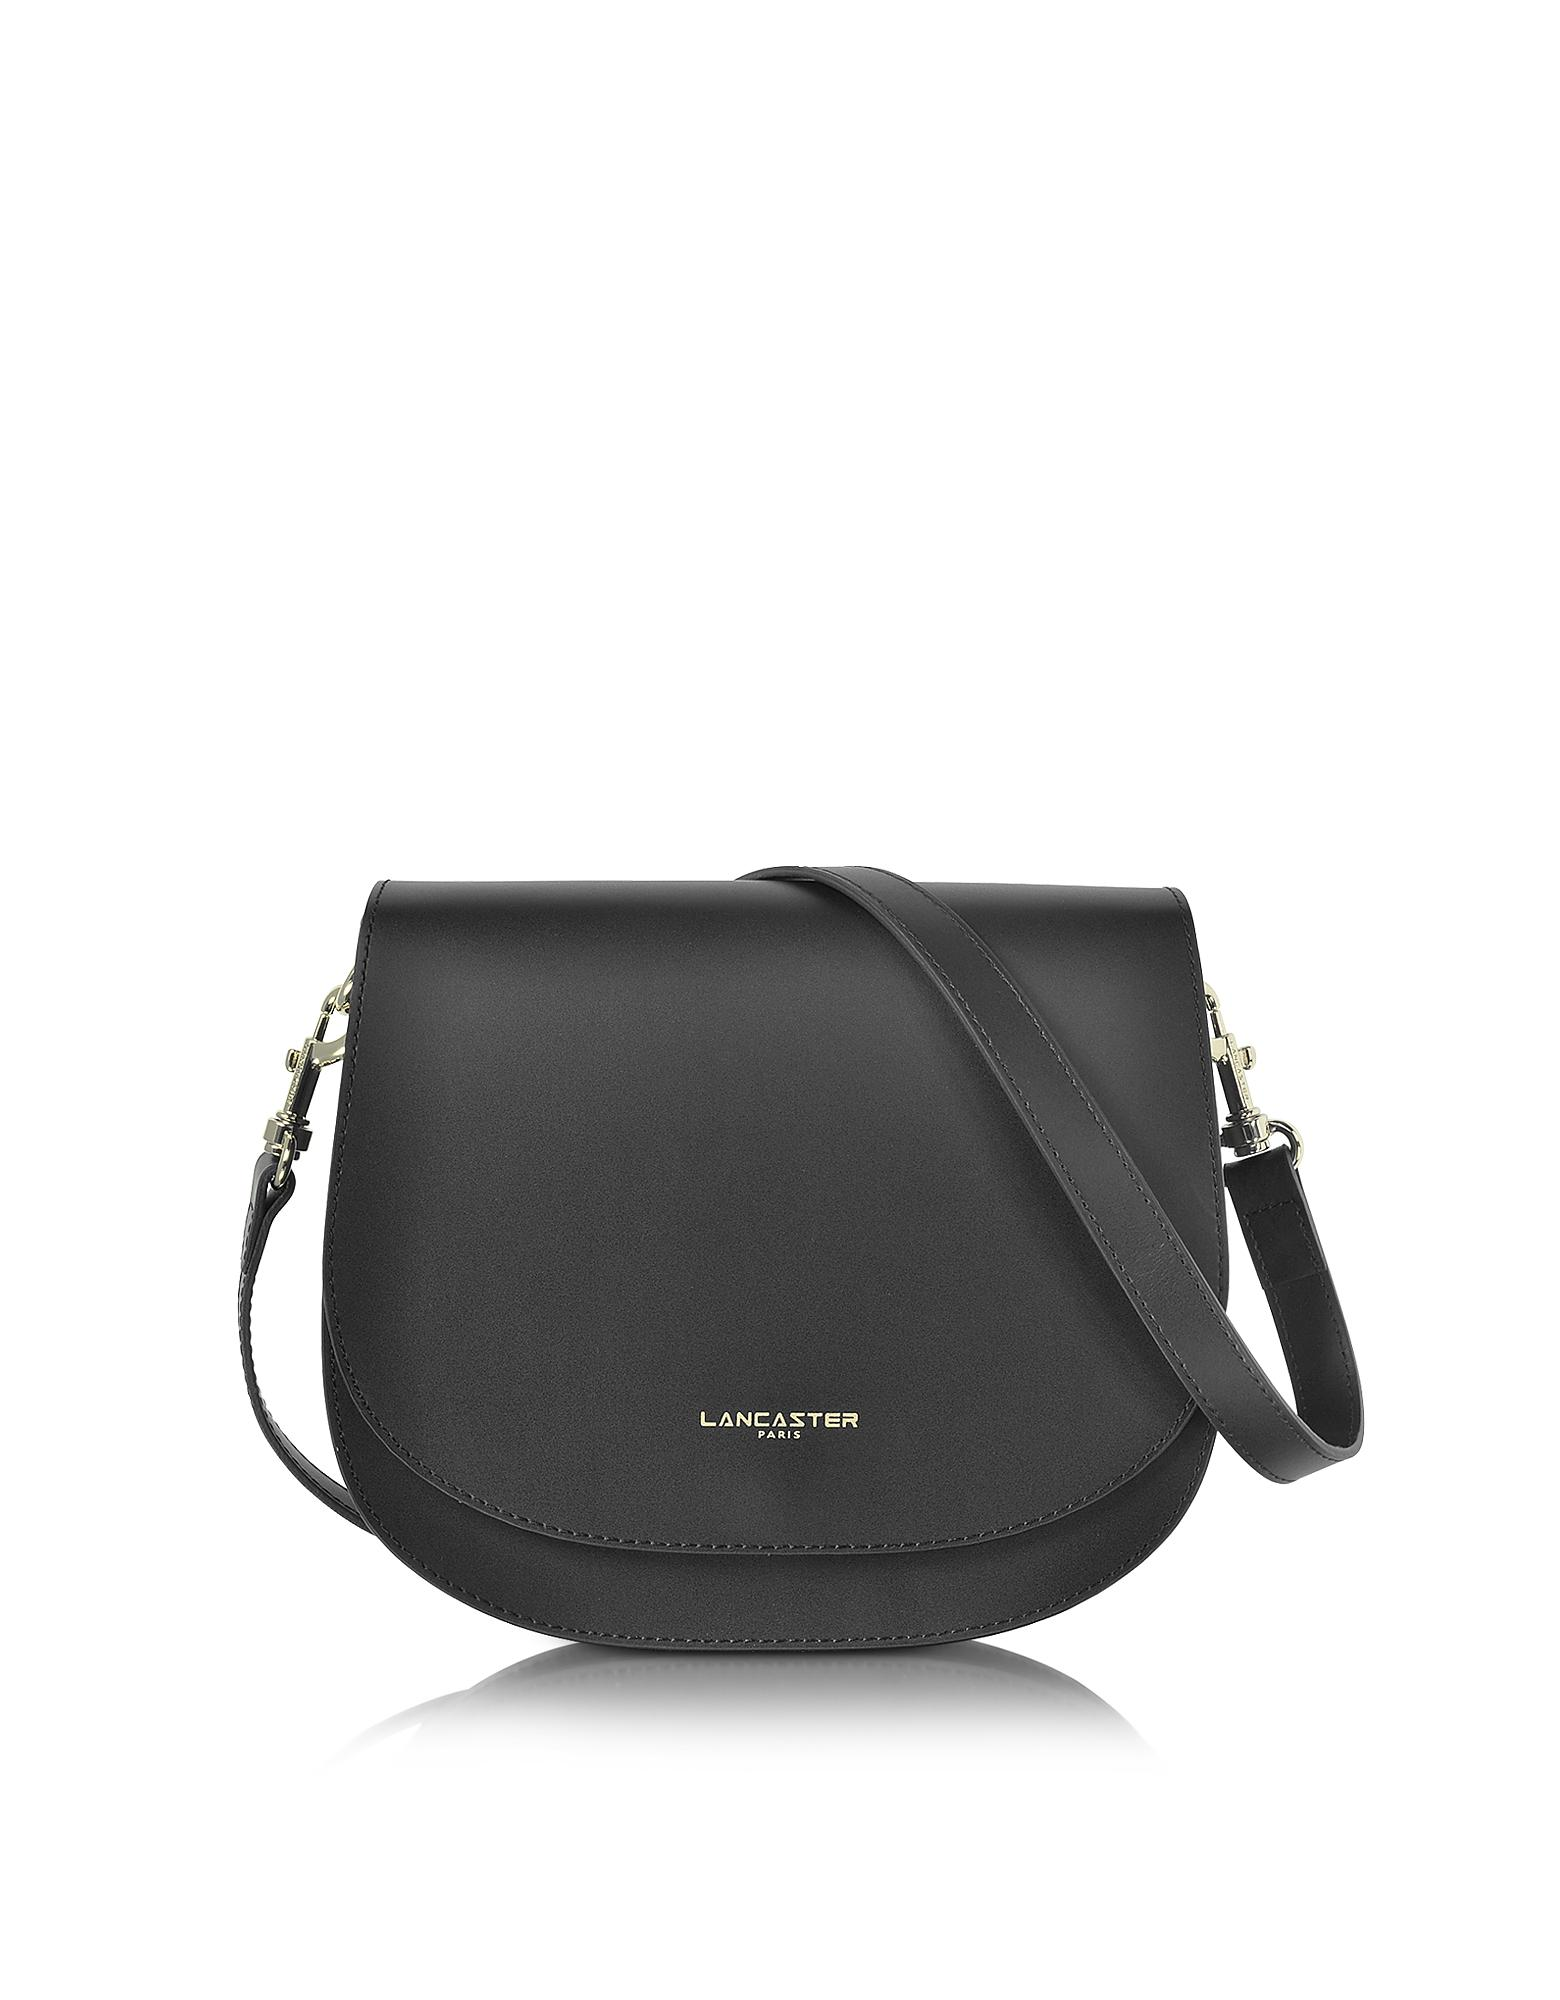 b6784b967961 Lancaster Paris Camelia Leather Crossbody Bag in Black - Lyst